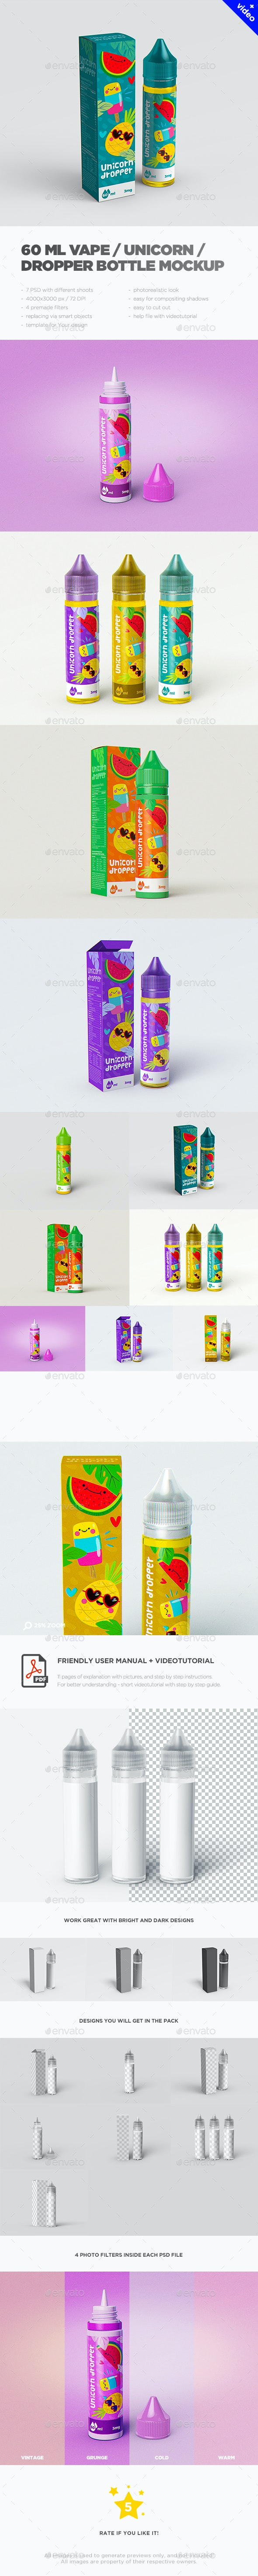 Vape / Unicorn Dropper Bottle MockUp - Miscellaneous Packaging